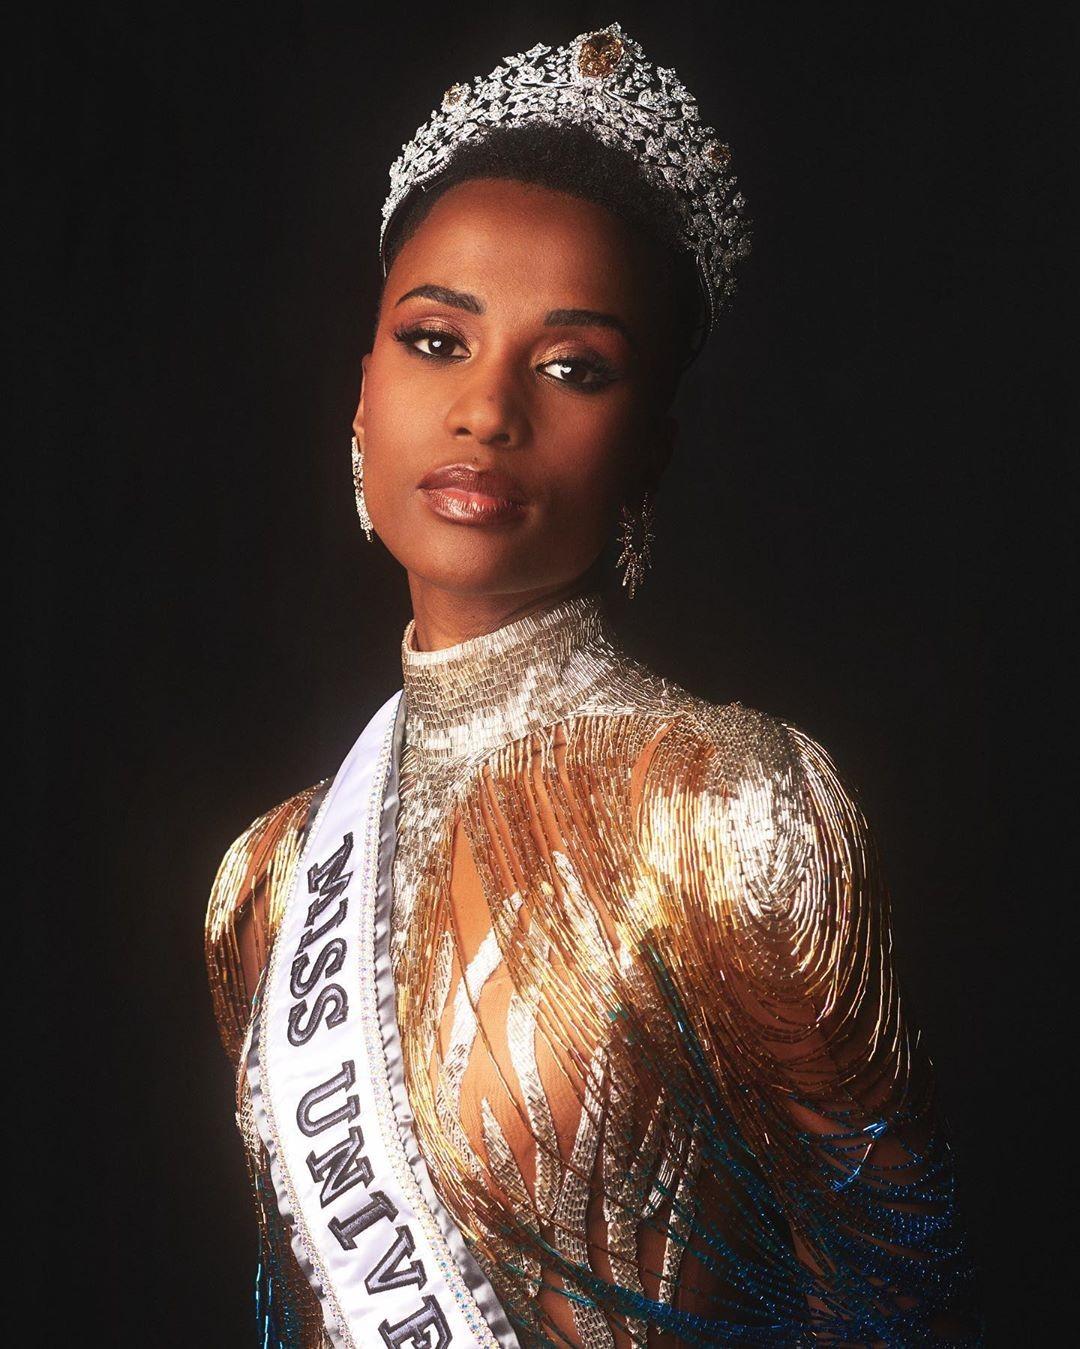 Zozibini Tunzi vence o concurso Miss Universo 2019 (Foto: Reprodução/Instagram)